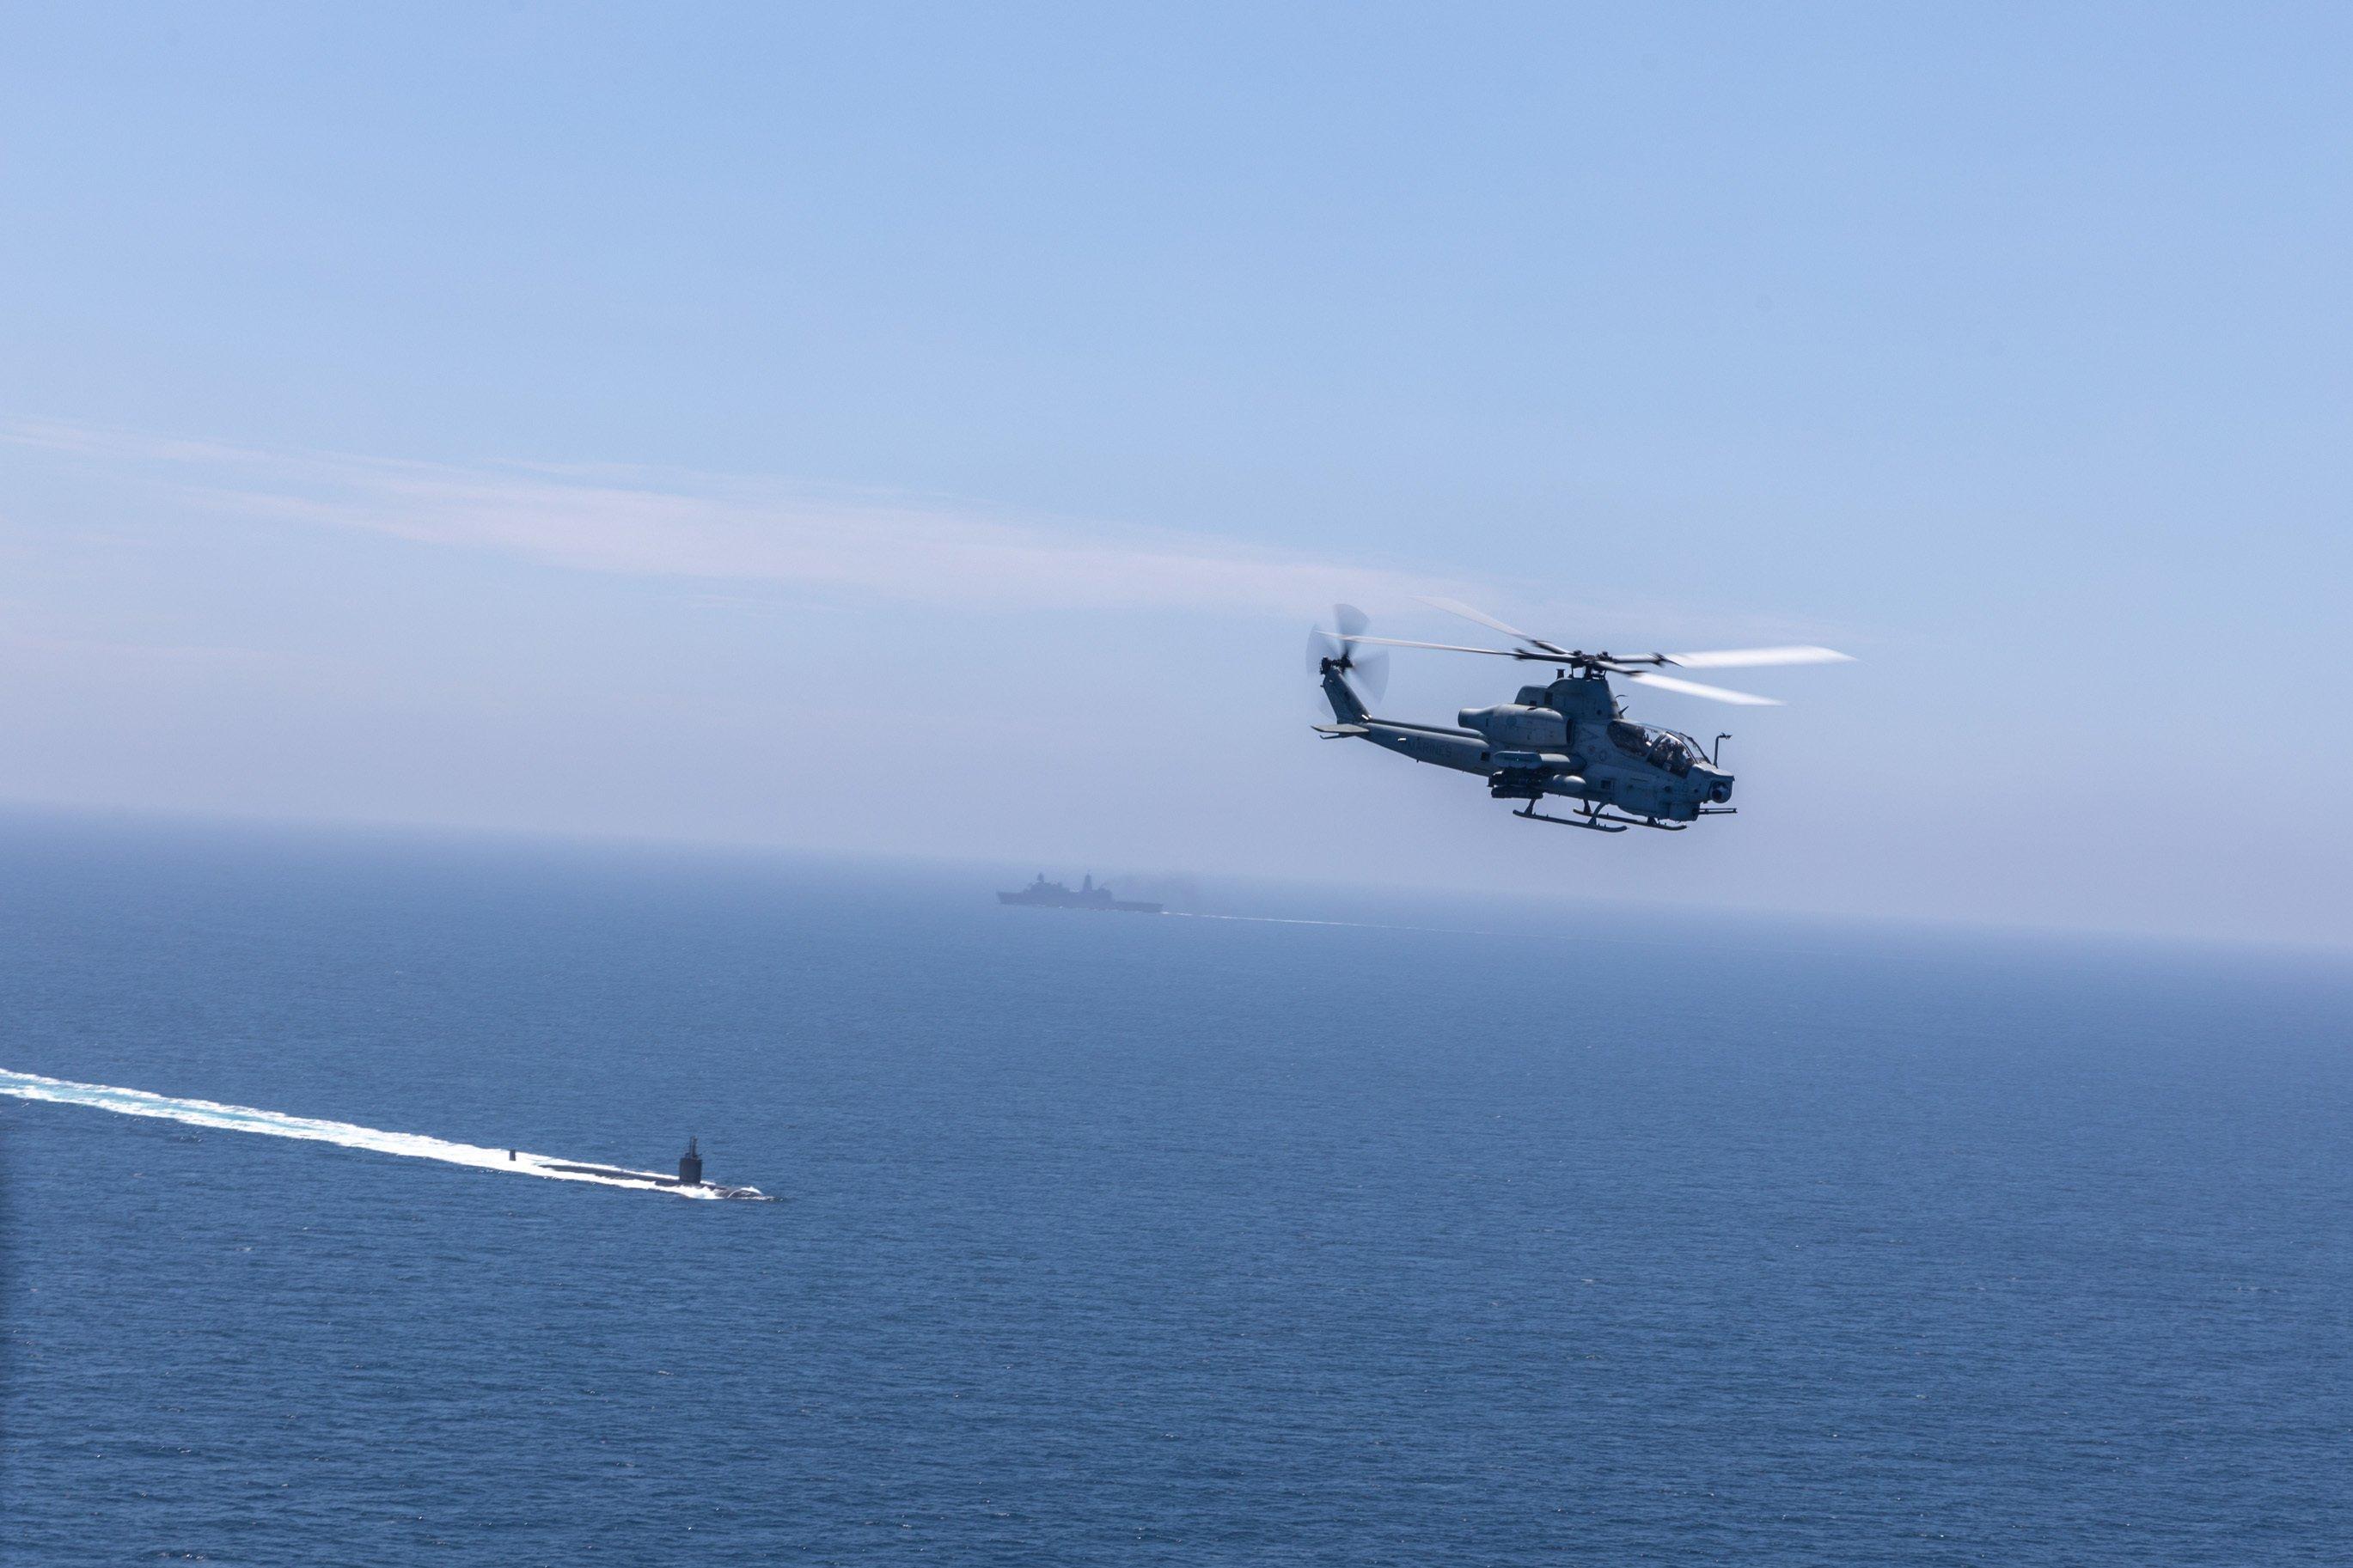 USMC HMLA-267 AH-1Z over USN sub in Pacific during Ex Summer Fury 20-07-21 [USMC/Lance Cpl Isaac Velasco]